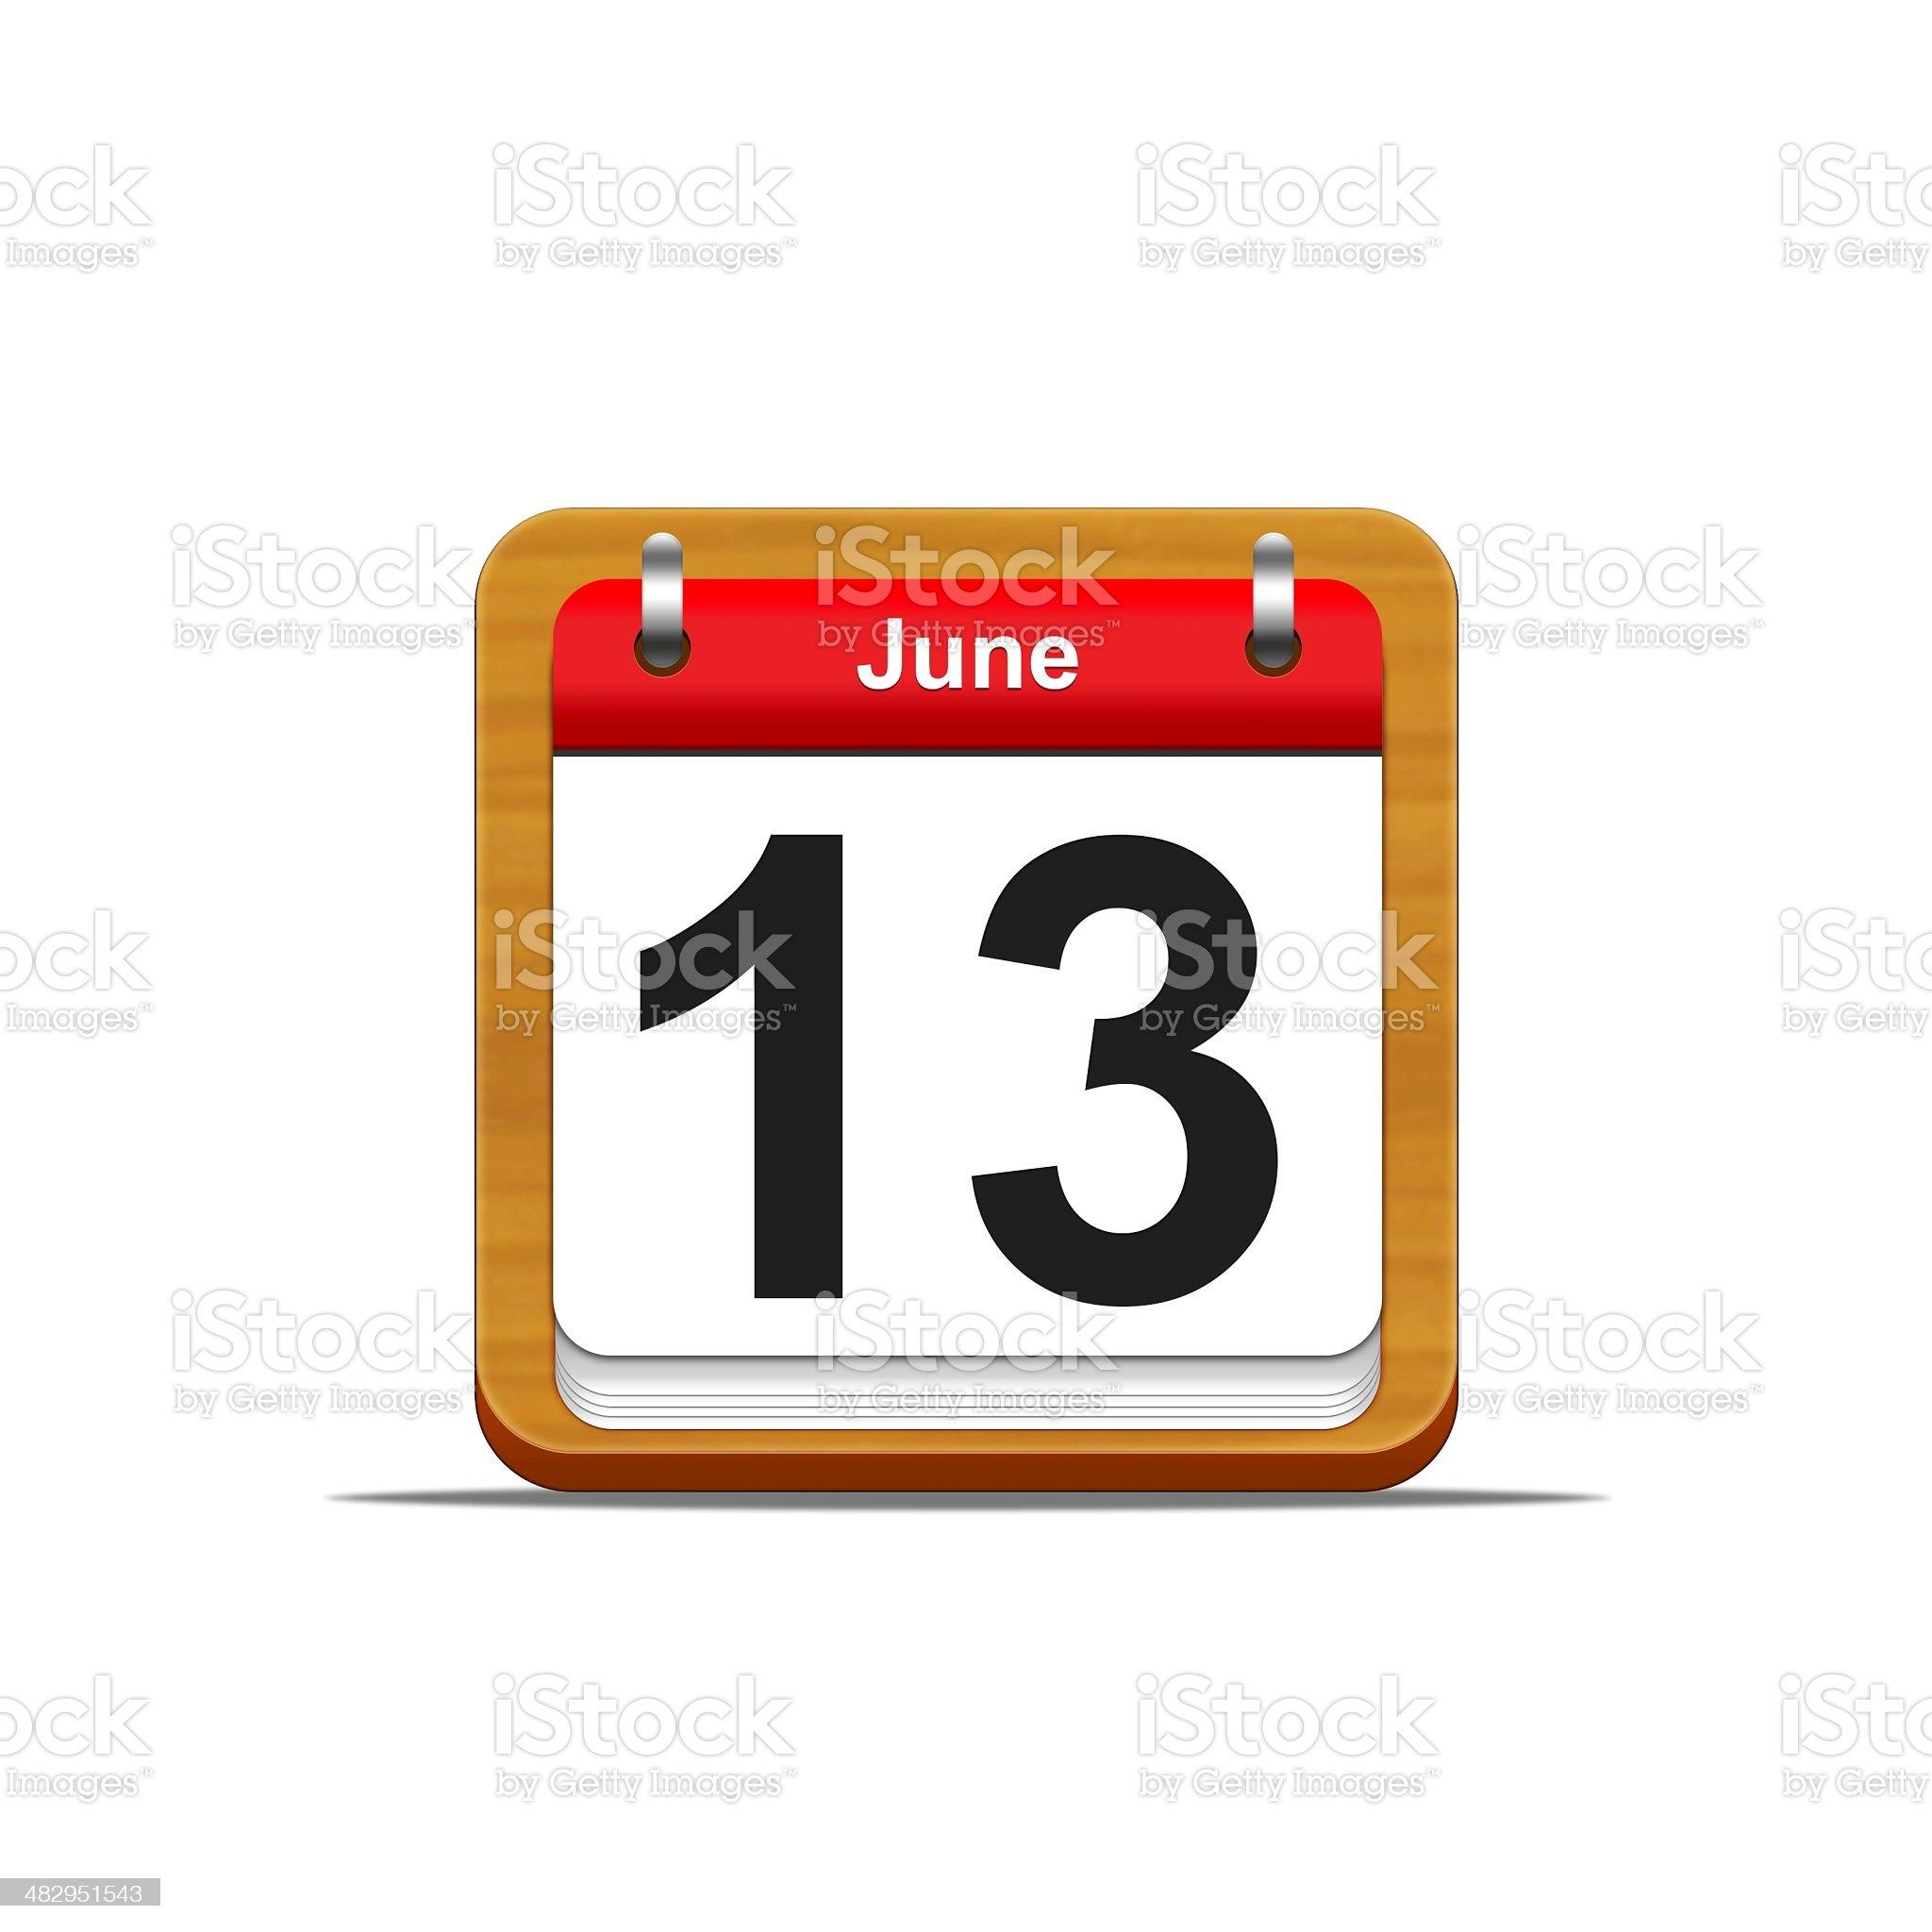 June 13. royalty-free stock vector art